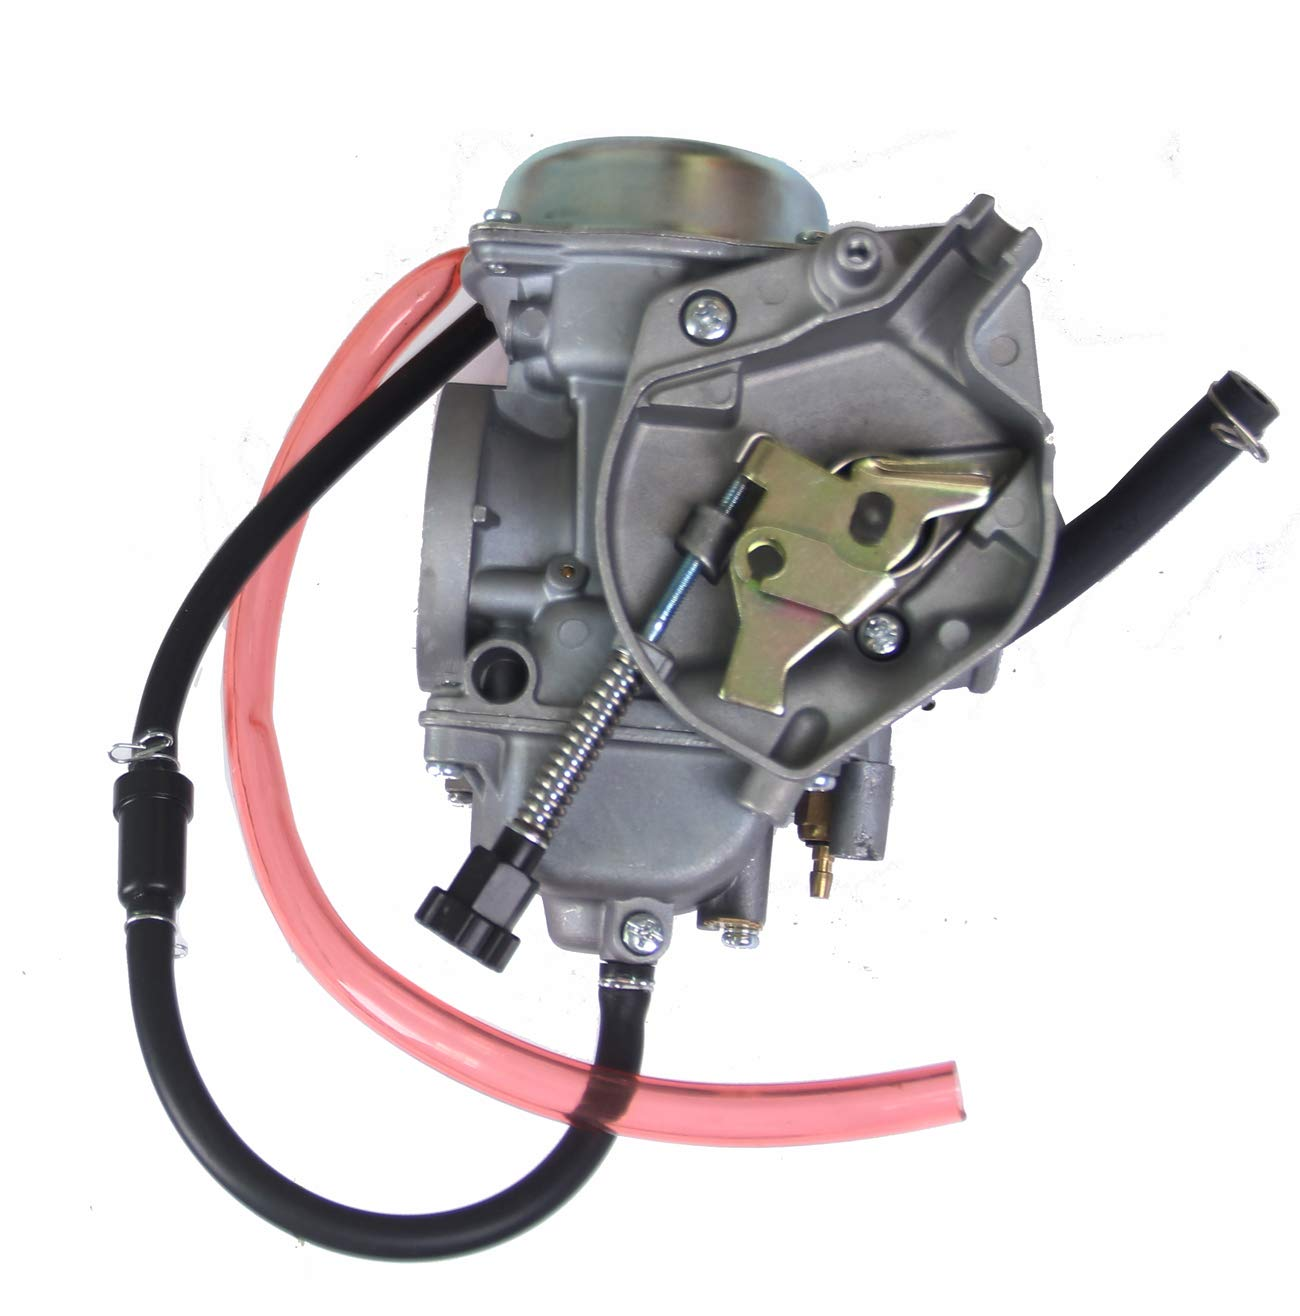 Motorcycle & ATV New Carburetor For Suzuki Vinson 500 LTF500F 4x4 ...